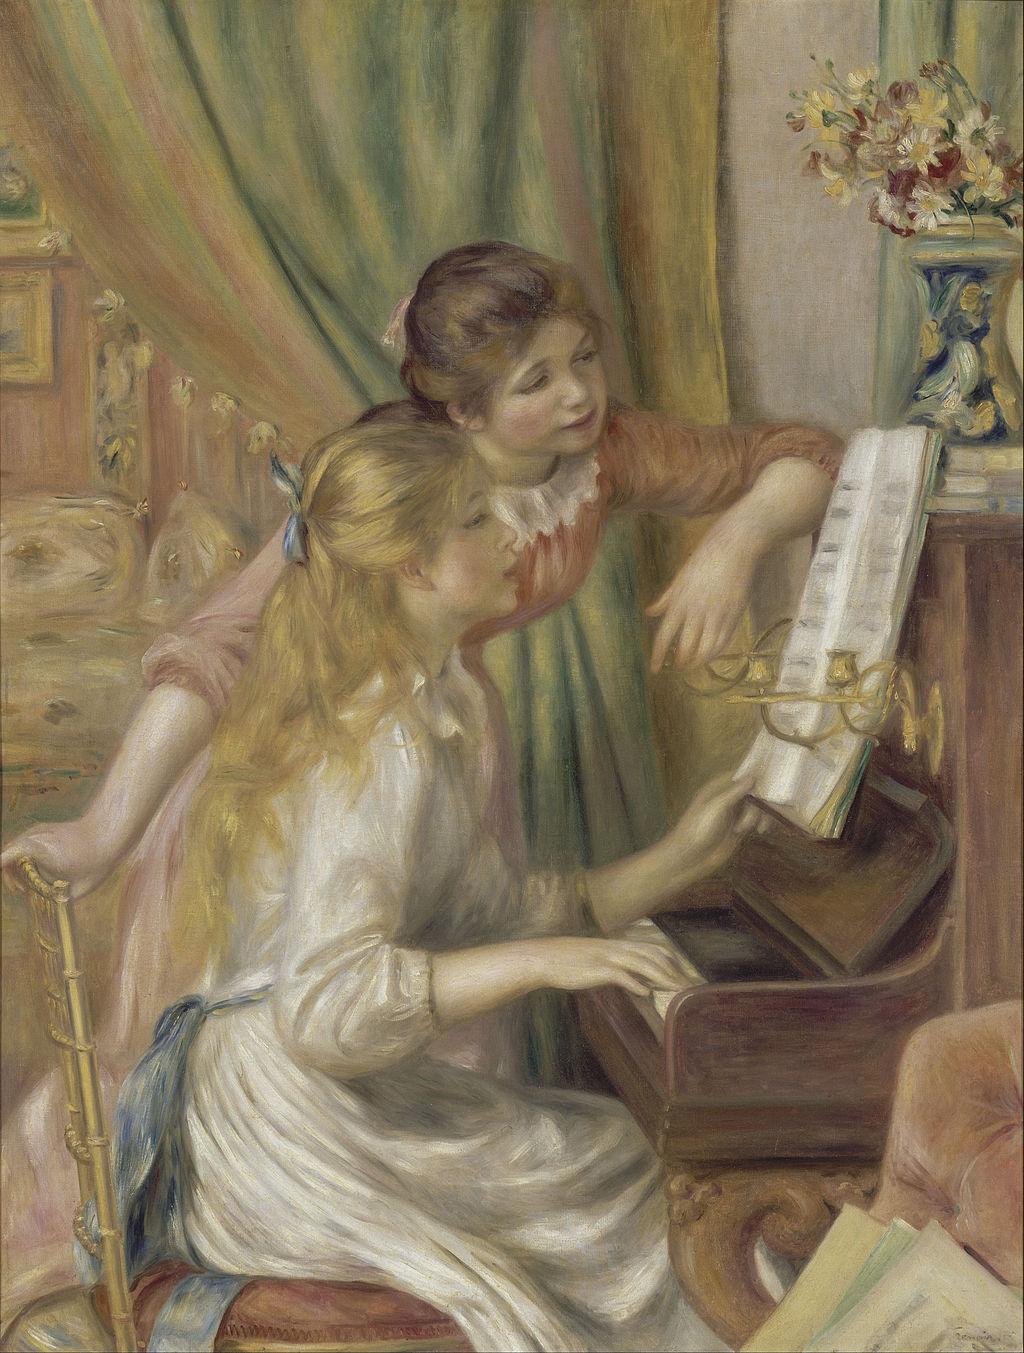 Piano à Key-Huset, #1